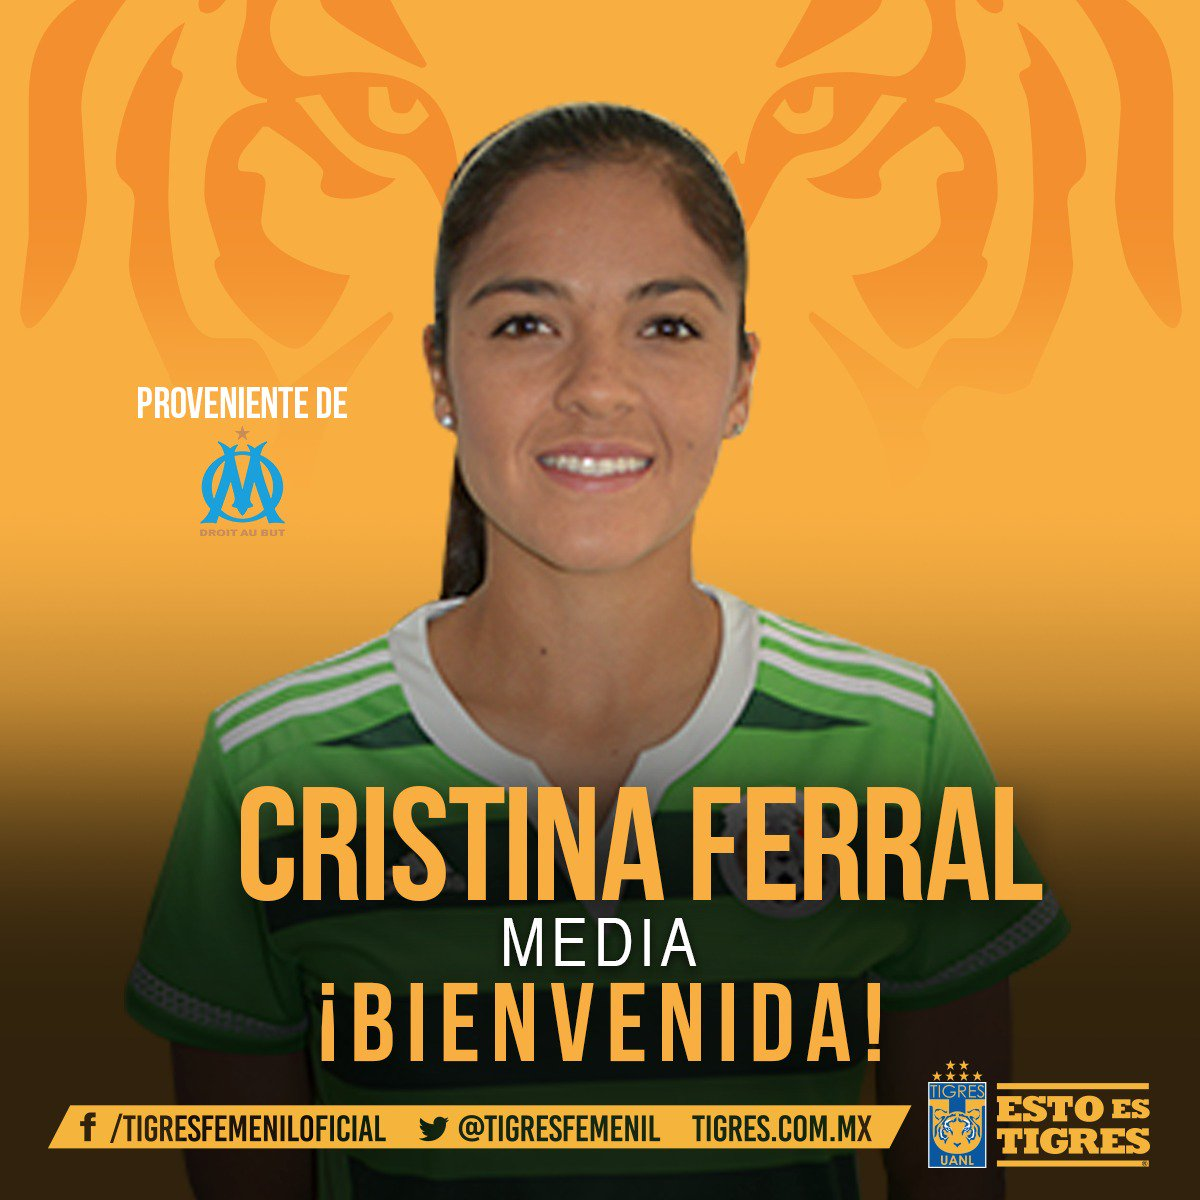 Cristina Ferral